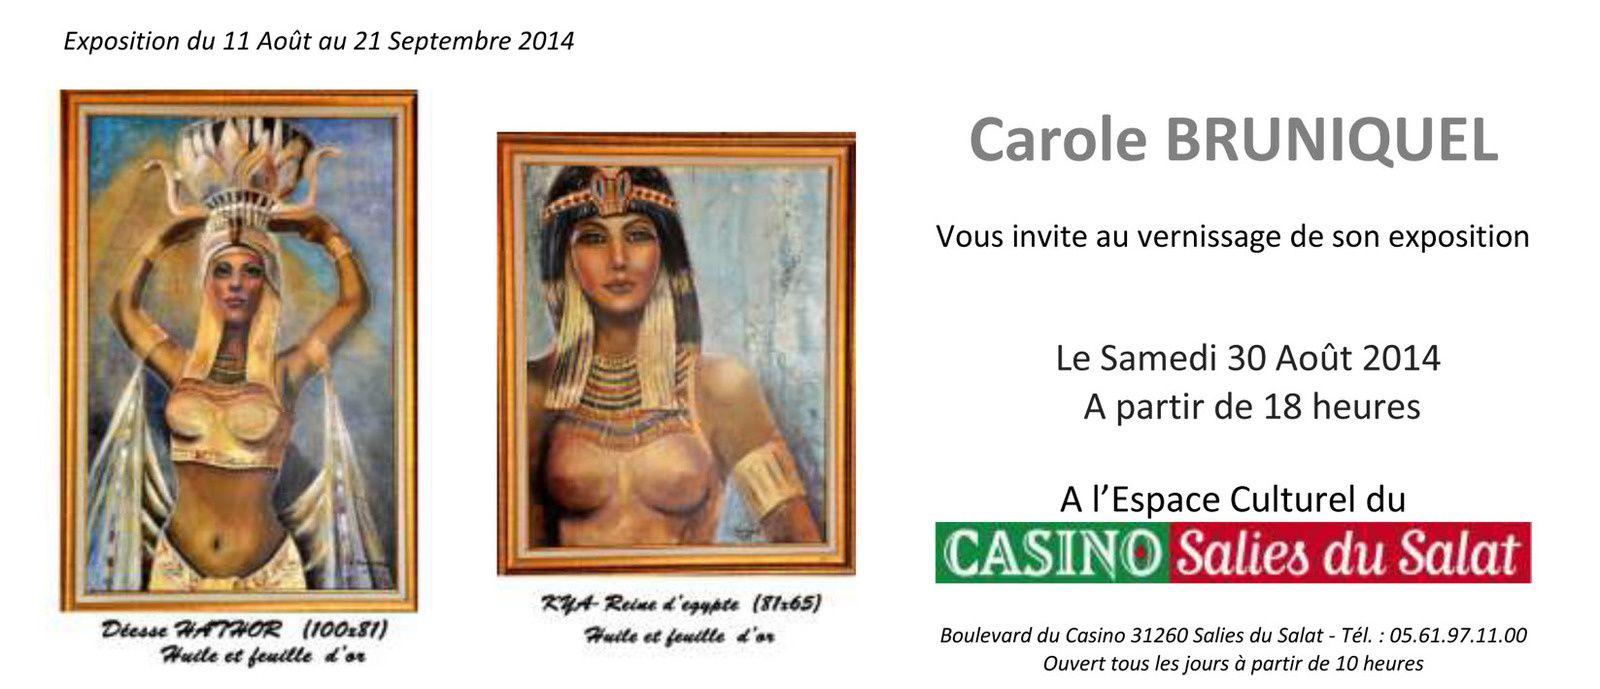 Carole BRUNIQUEL expose à Salies du Salat